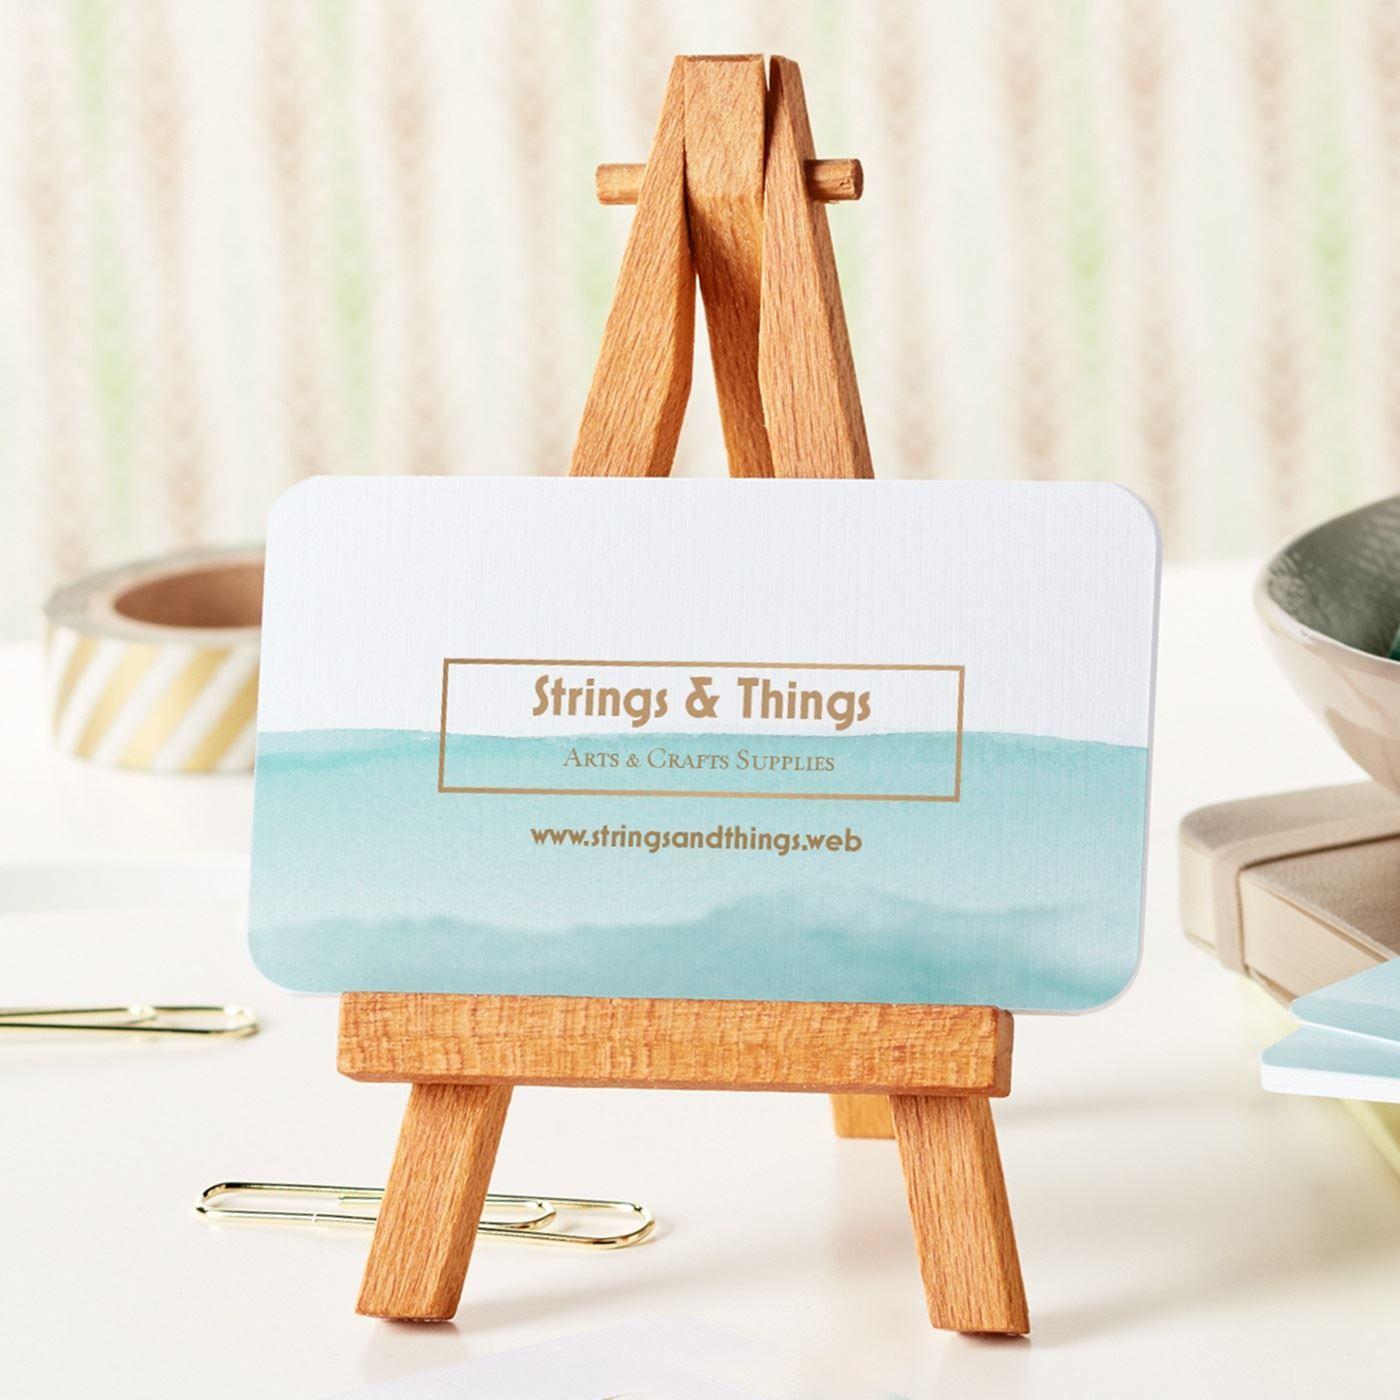 Rounded Corner Business Cards Rounded Edge Cards Vistaprint Custom Business Card Holder Colored Edge Business Cards Square Business Cards